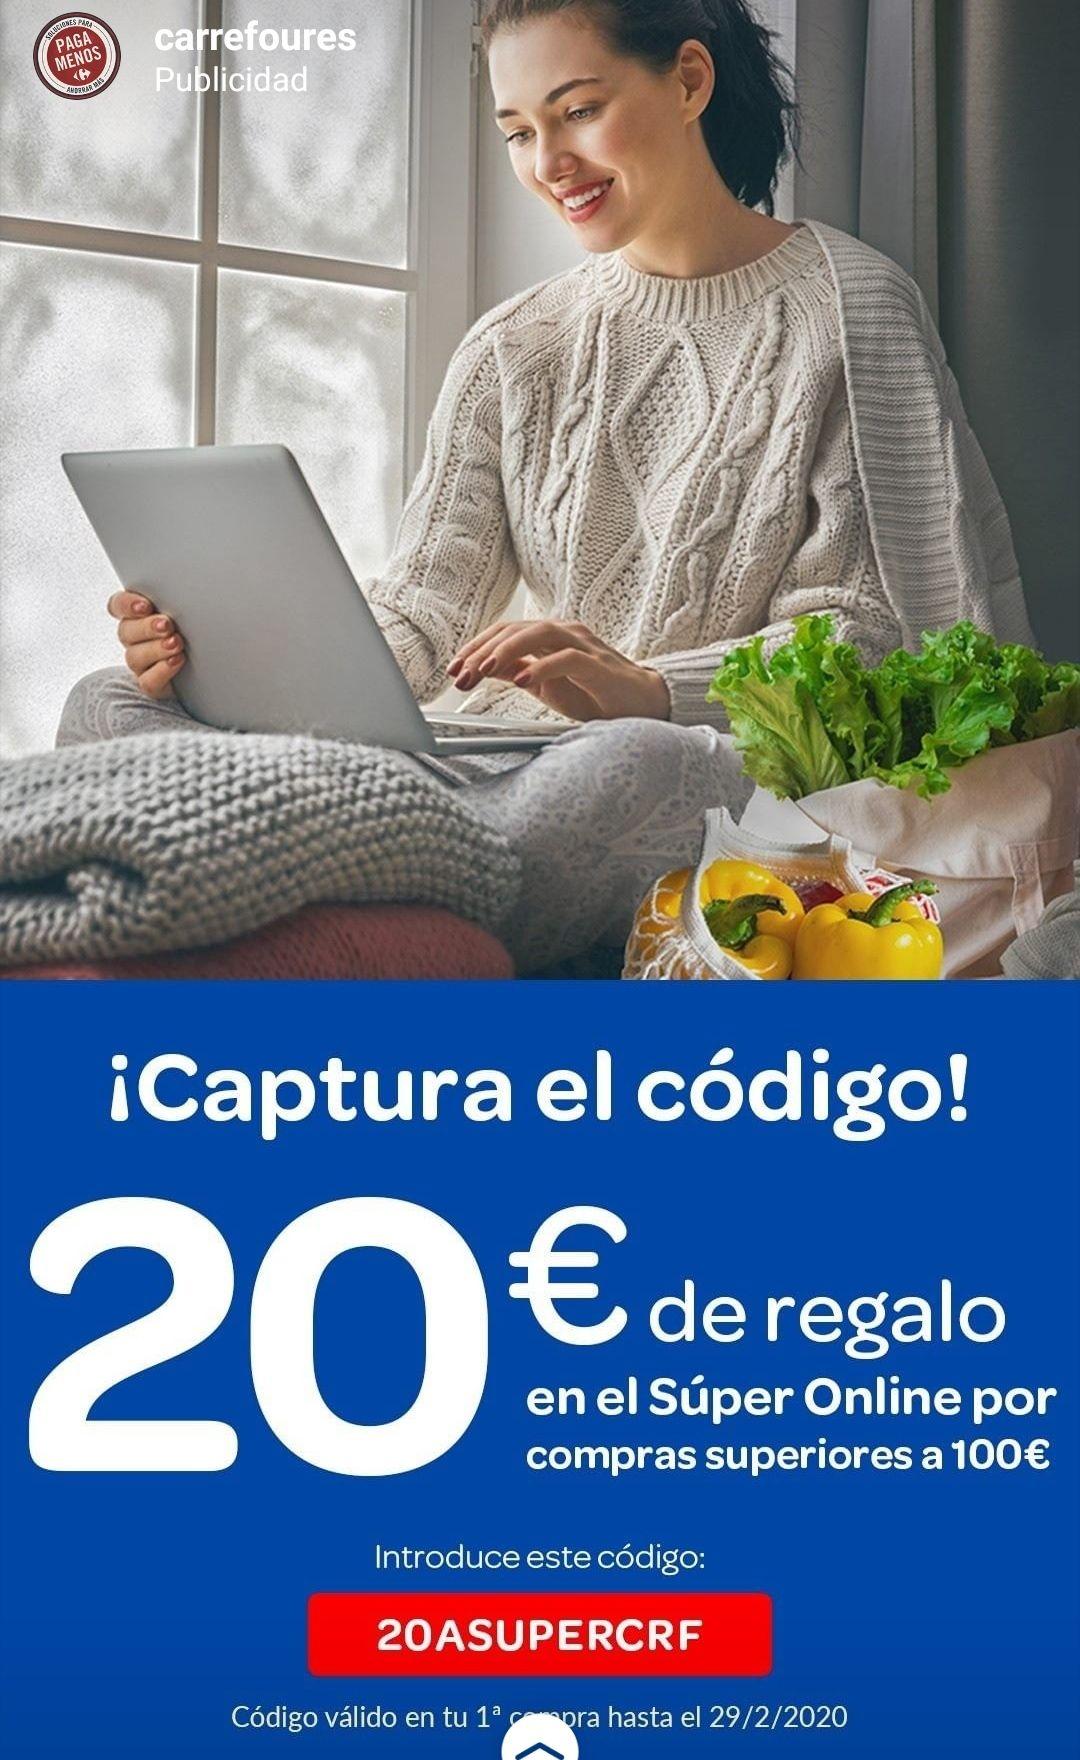 Carrefour 20€ de regalo por compras superiores a 100€